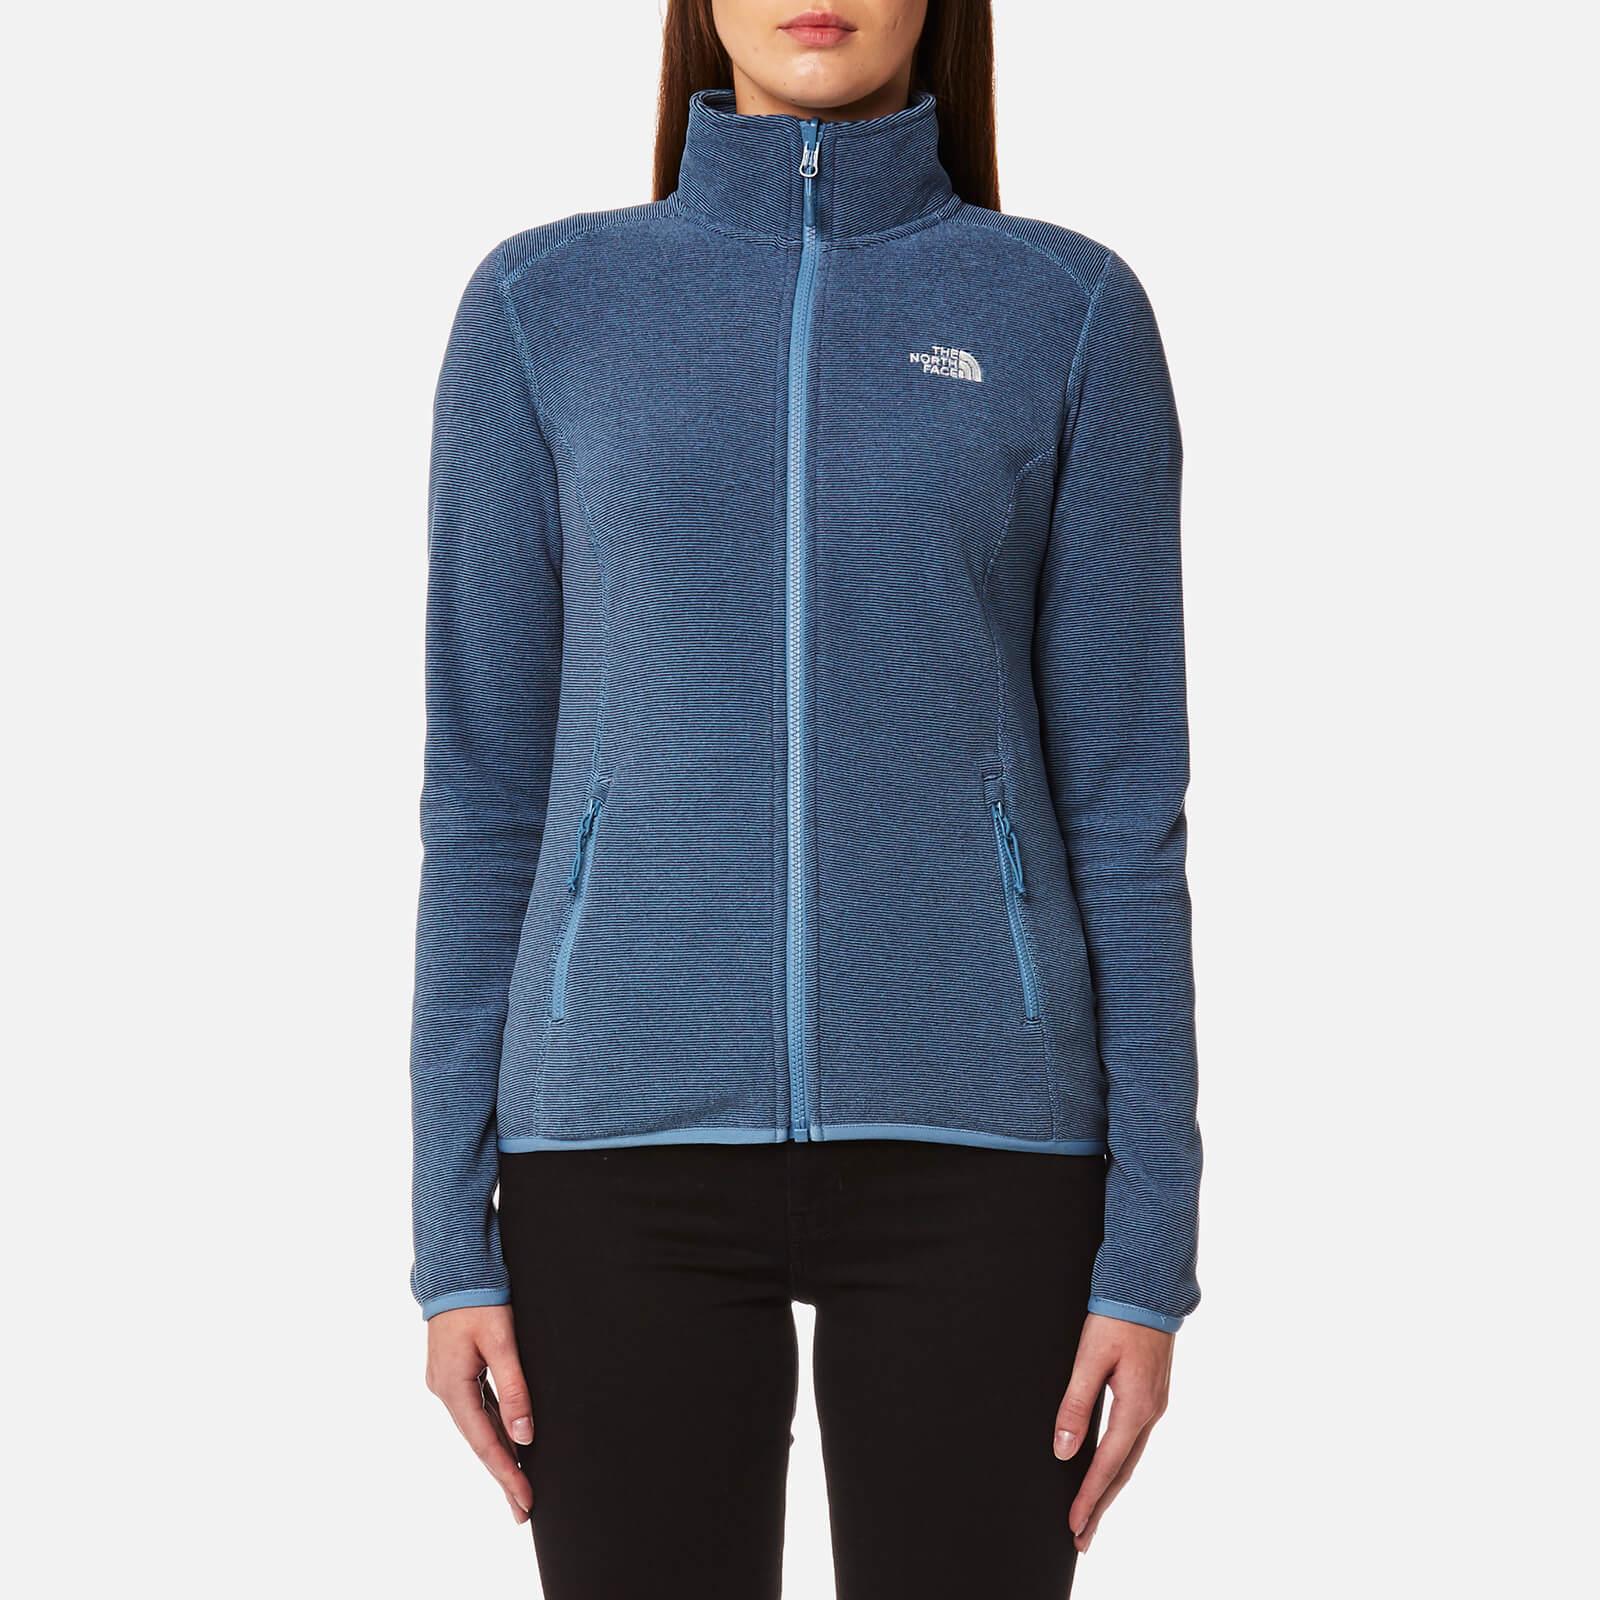 77138ff8c6a8 The North Face Women s 100 Glacier Full Zip Fleece Jumper - Provincial Blue  Stripe Womens Clothing